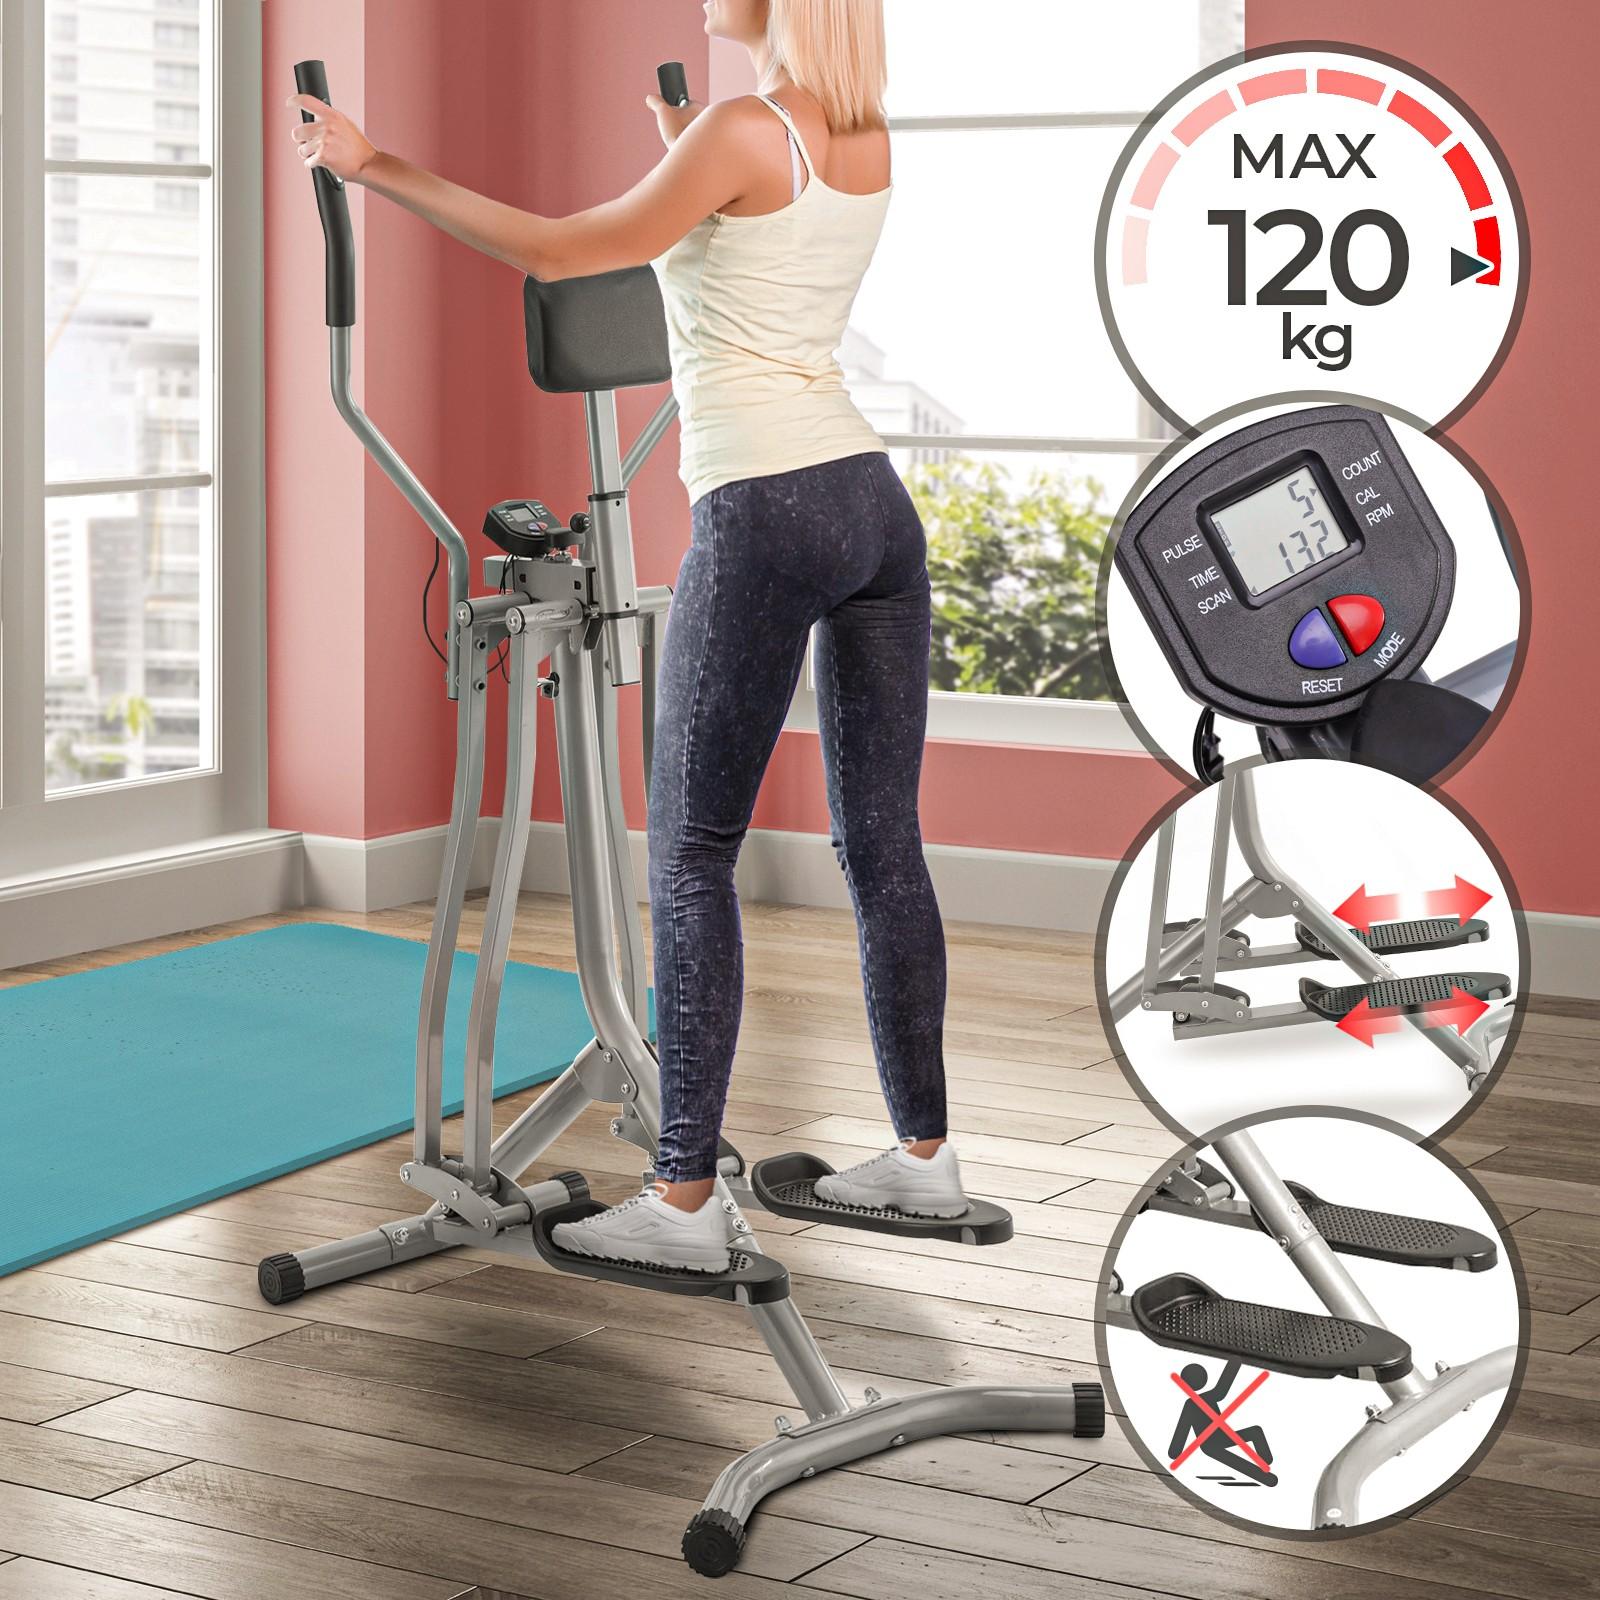 B-WARE Crosstrainer Ergometer Cardio Stepper Fitness Ellipsentrainer Puls